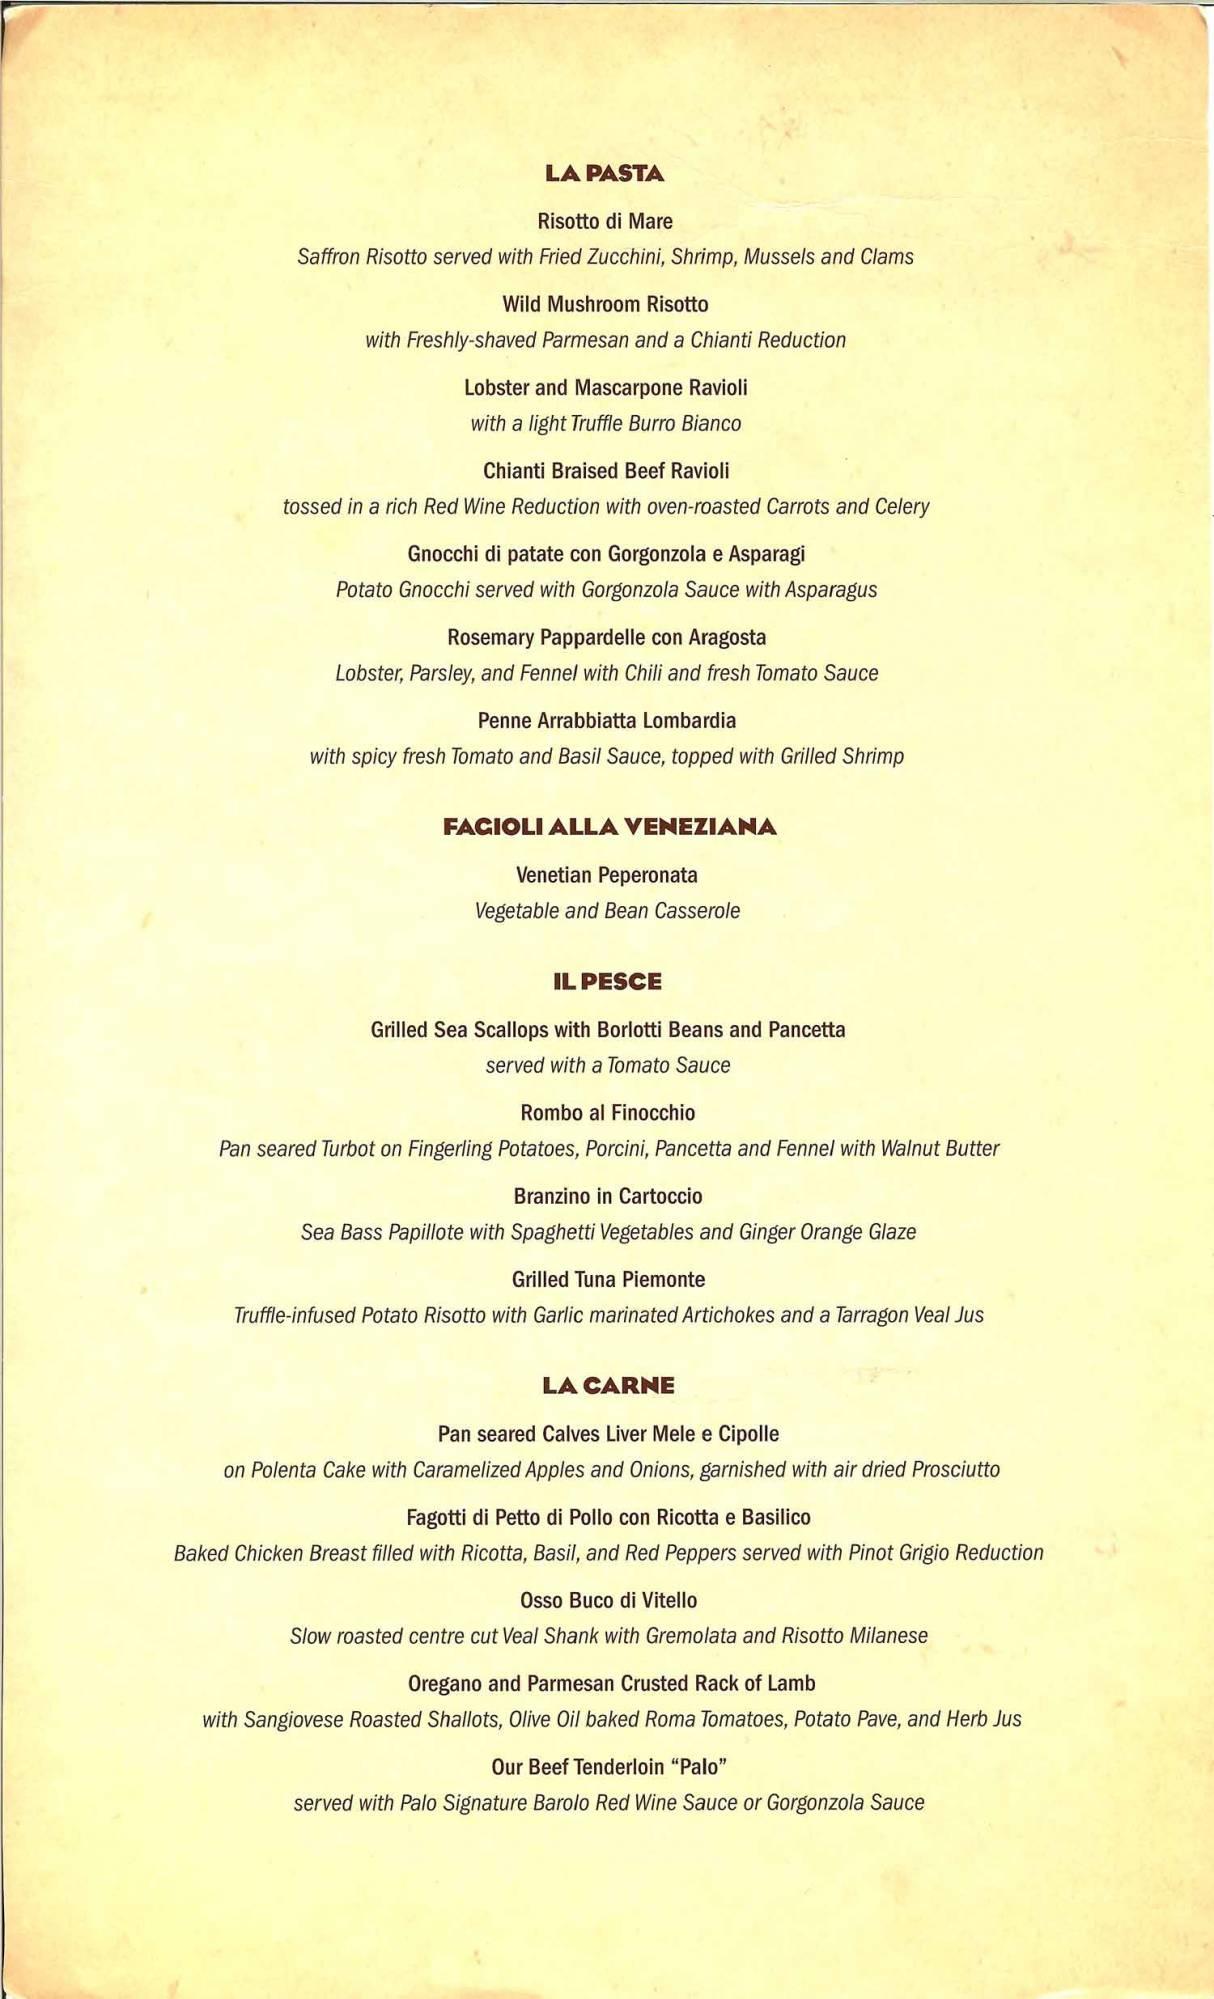 Disney Dream - Palo Dinner Menu 2/2